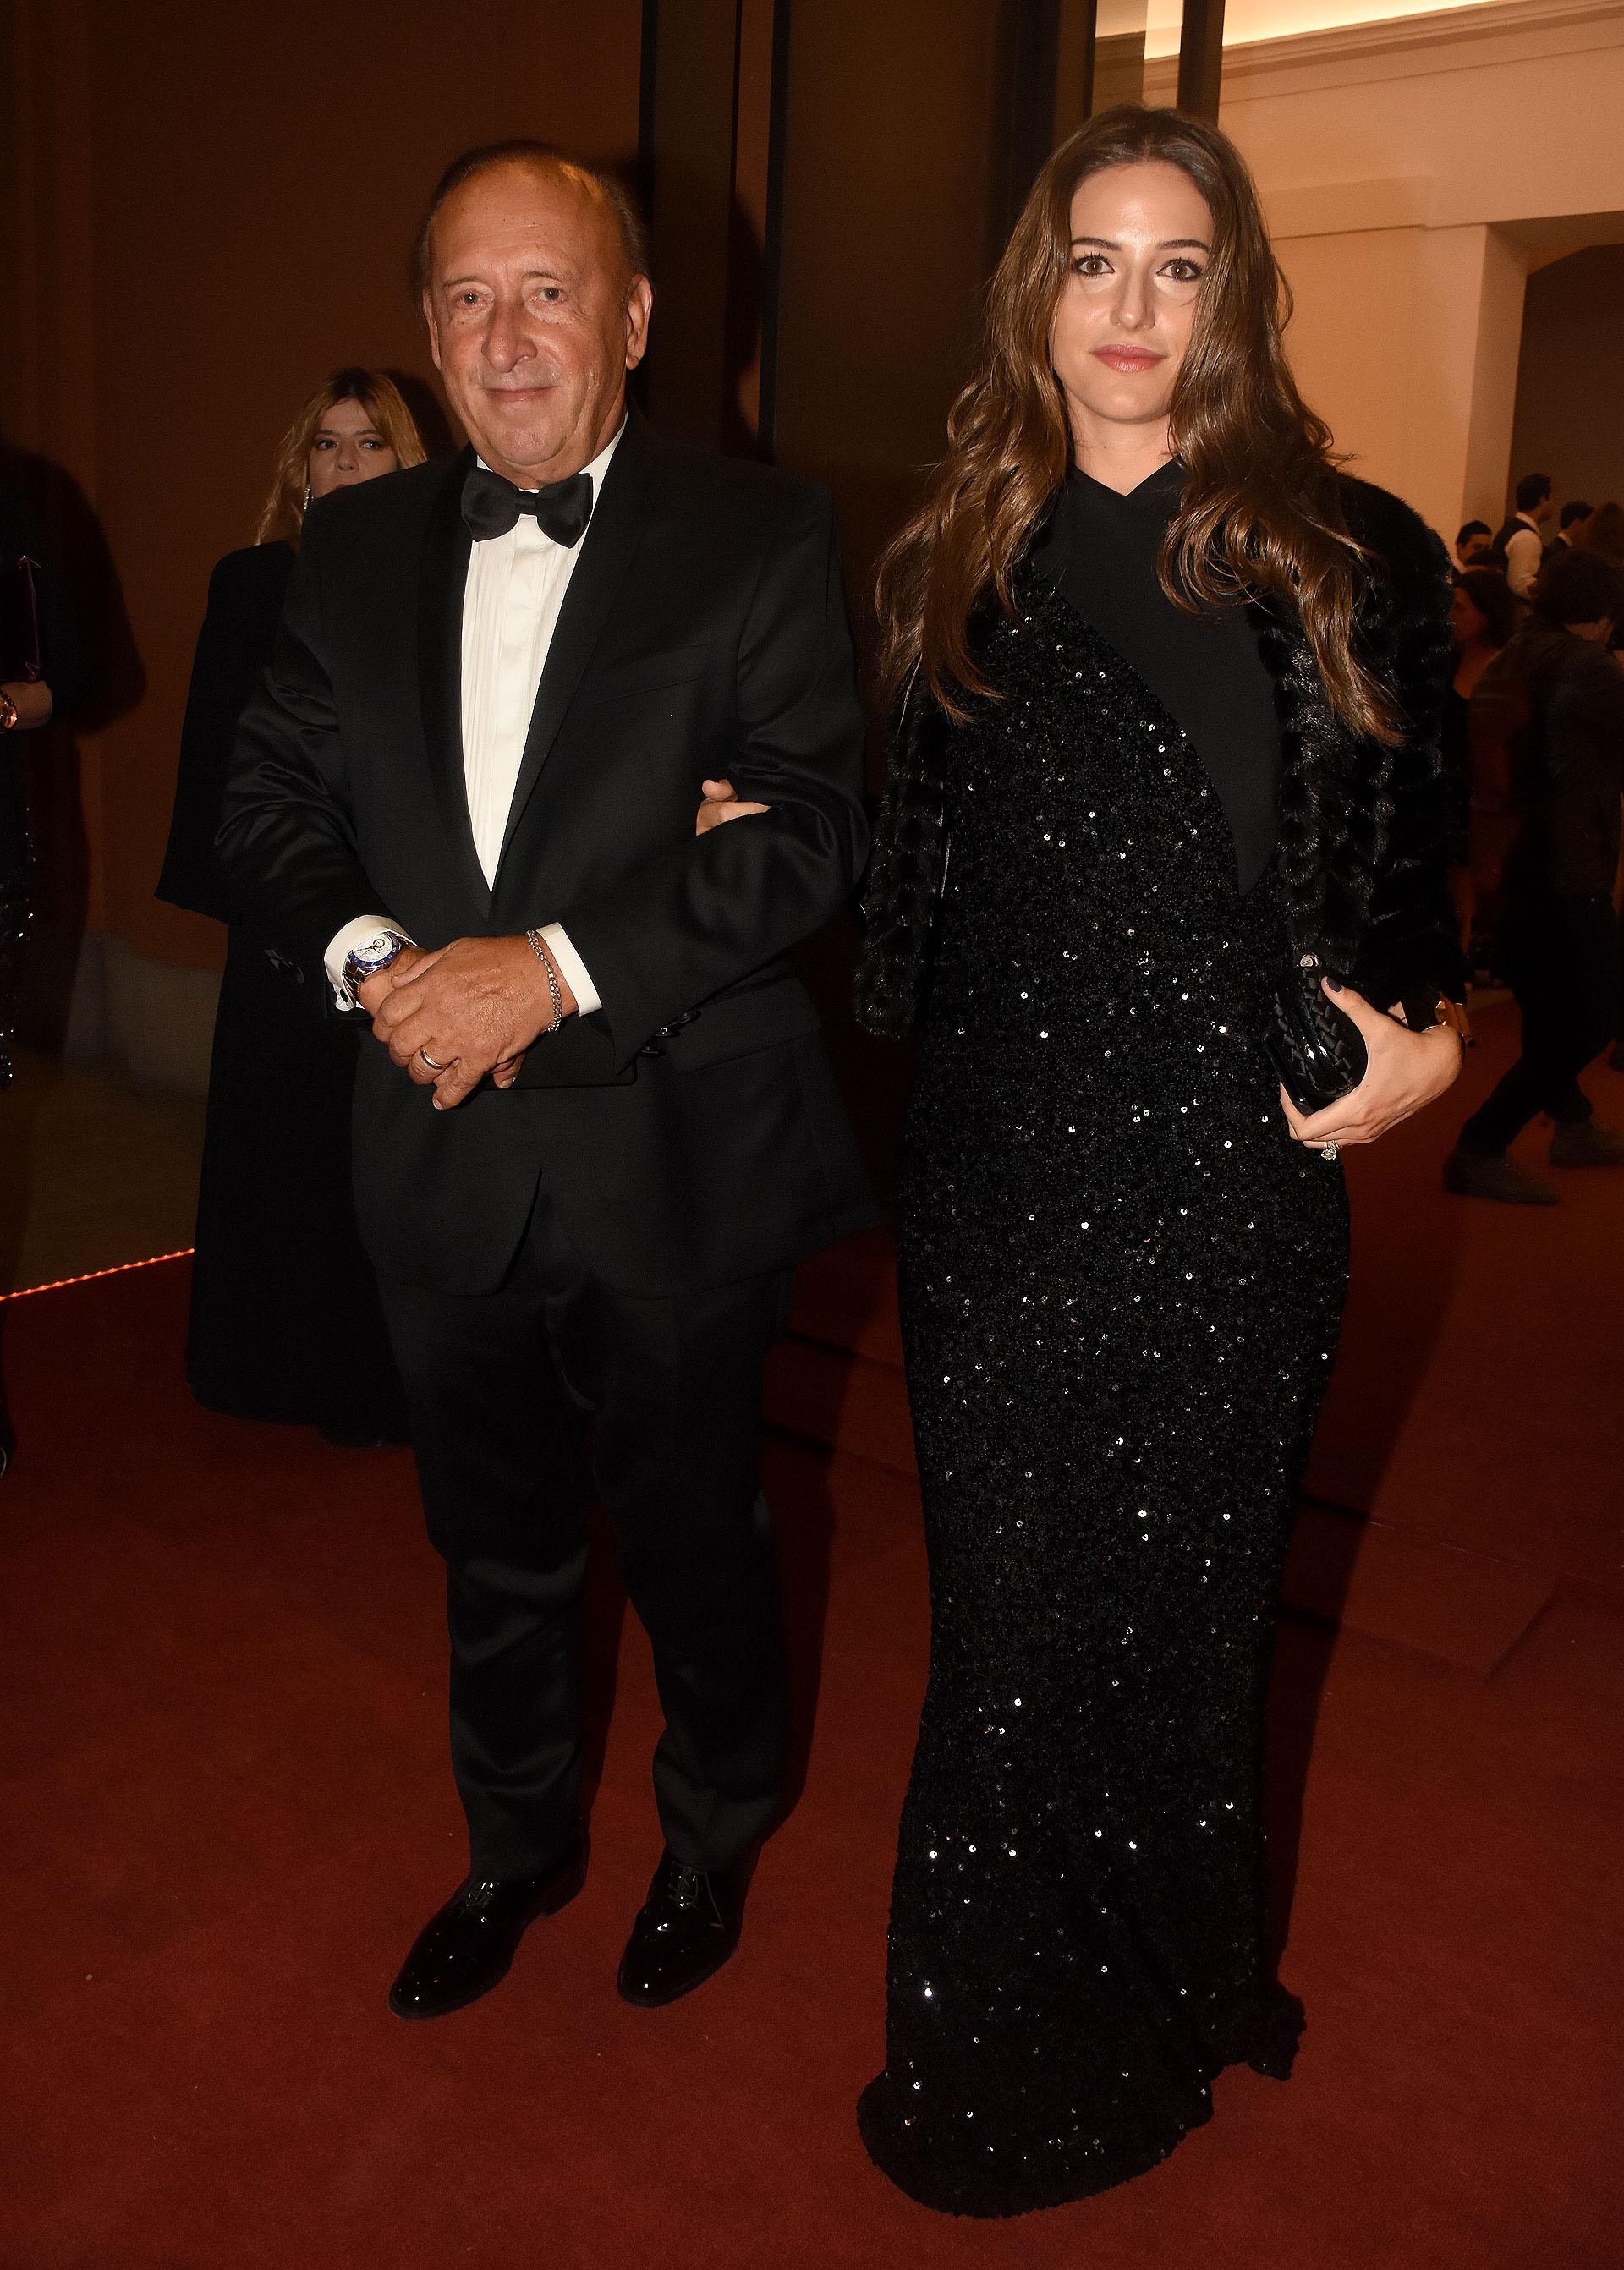 Mauricio Filiberti (Transclor) y su mujer Camila Pitana